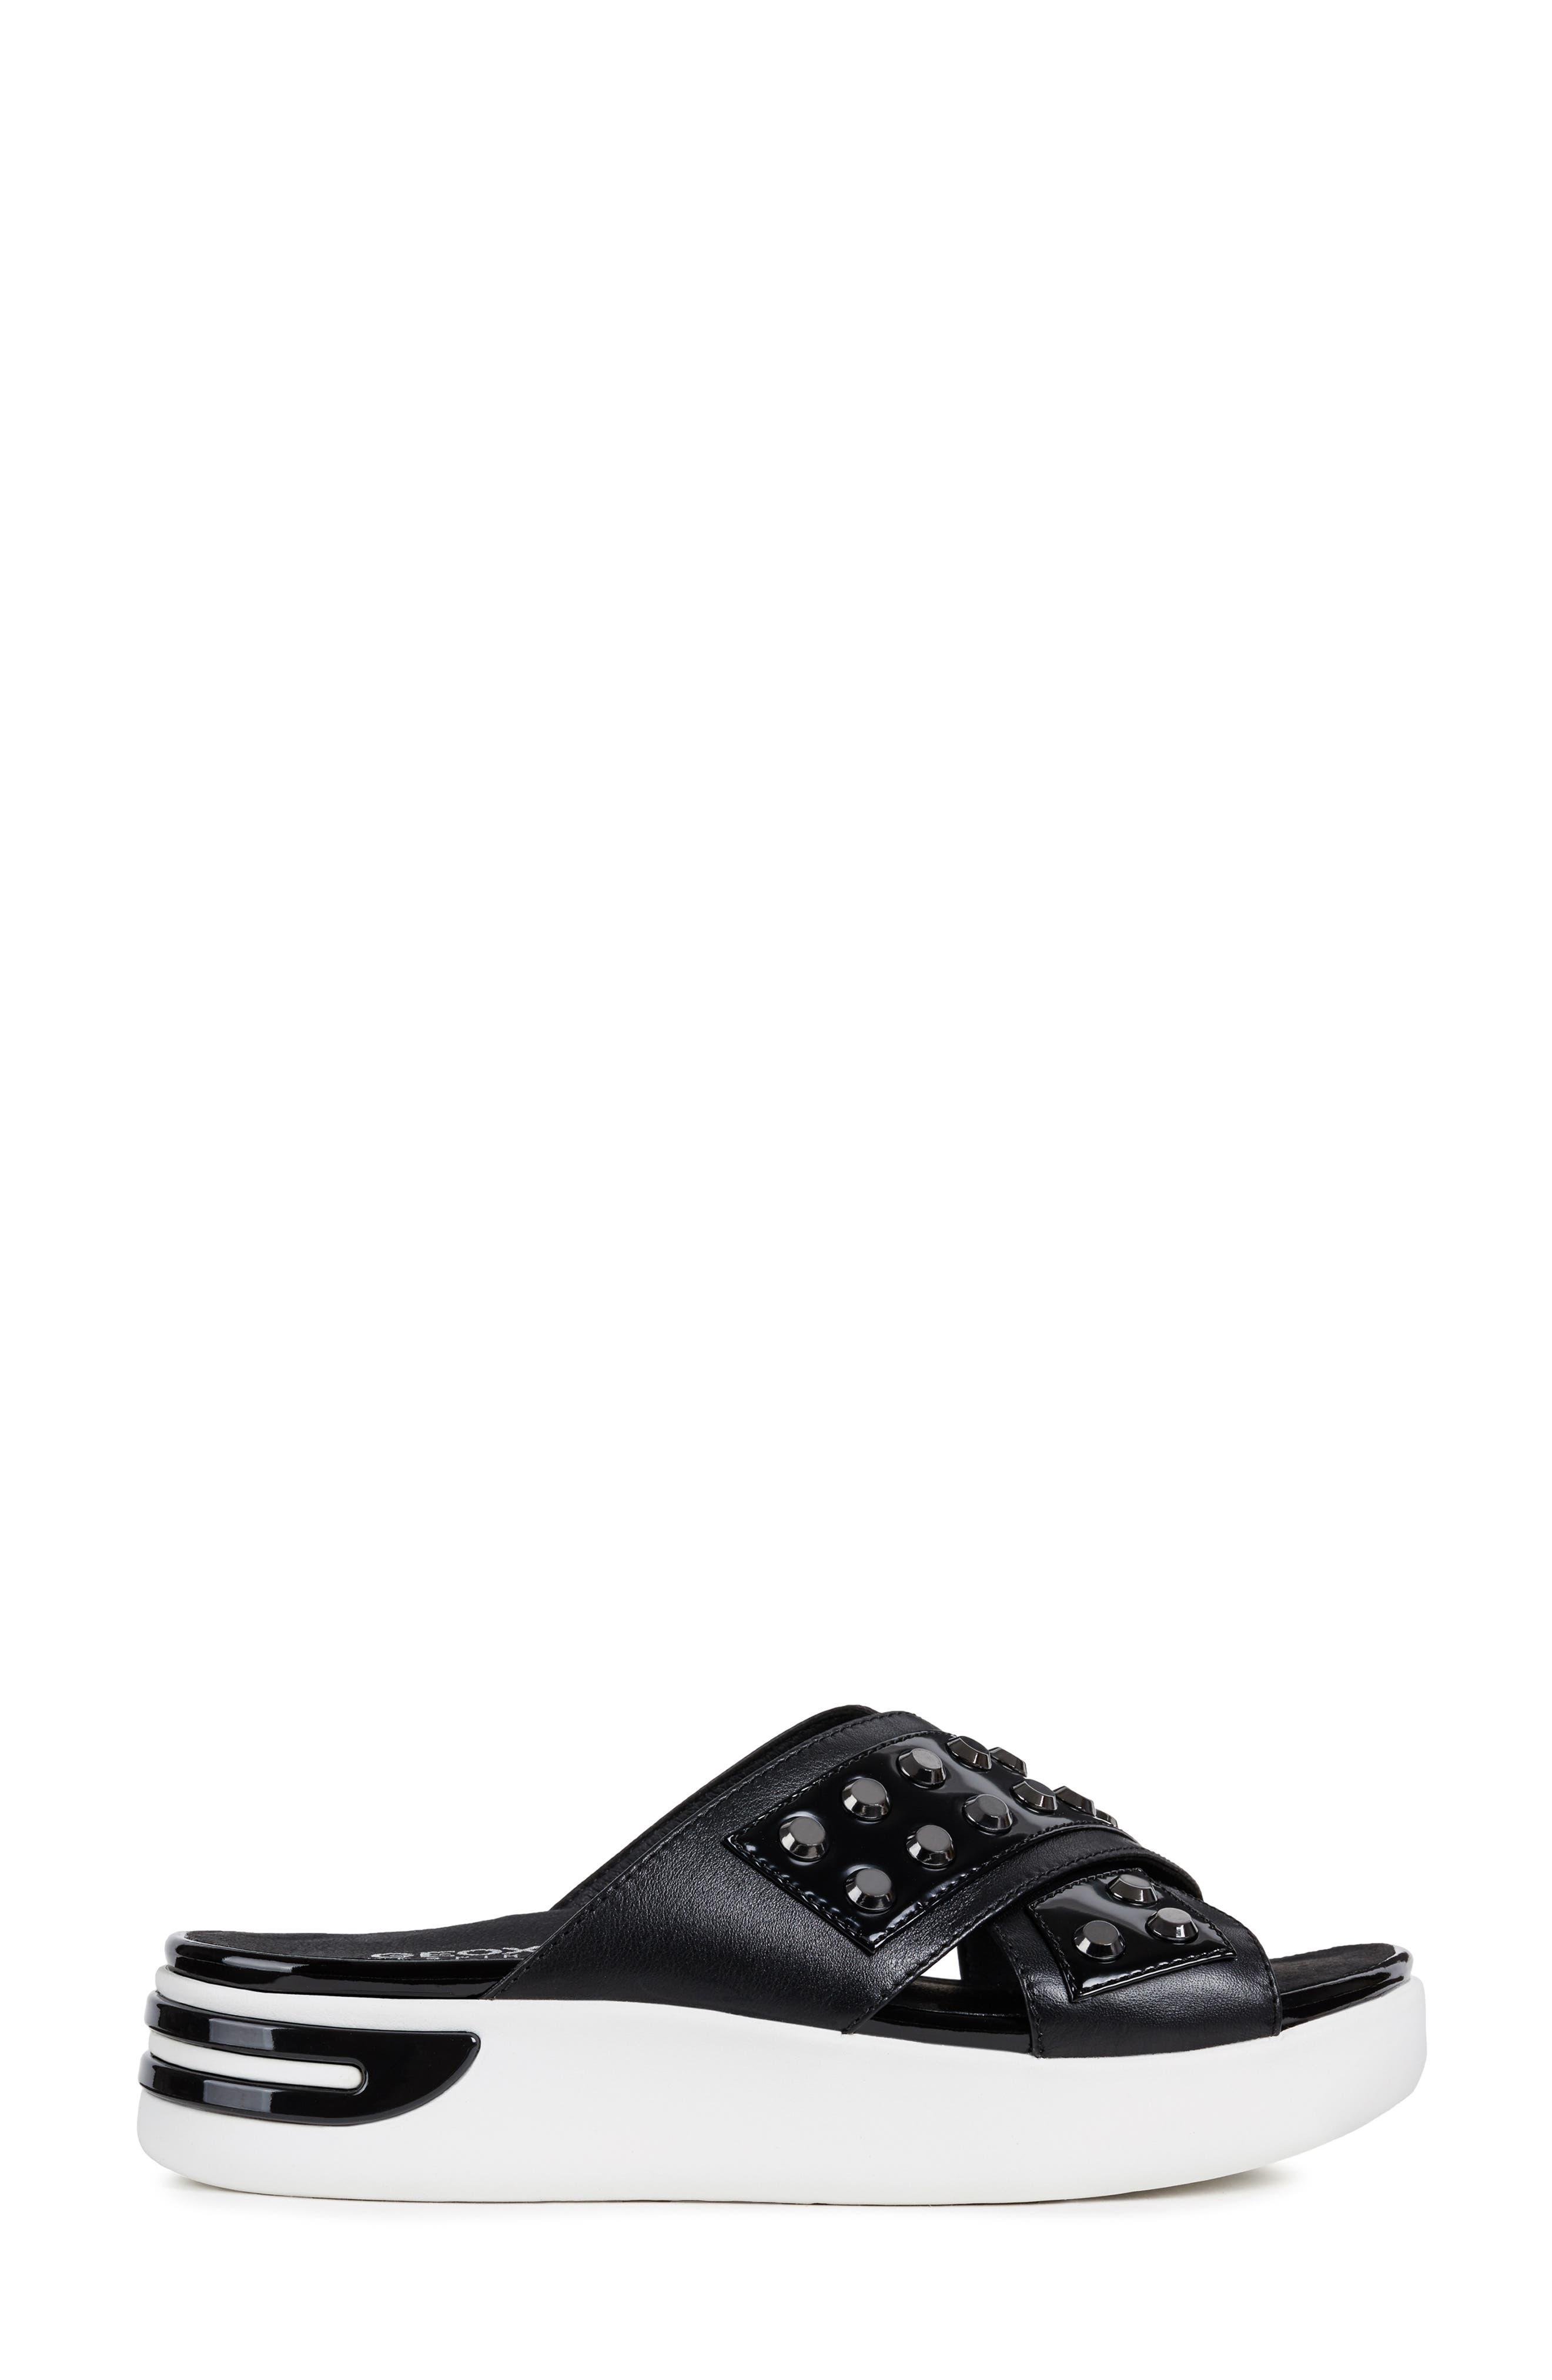 GEOX, Ottaya Studded Slide Sandal, Alternate thumbnail 3, color, BLACK LEATHER